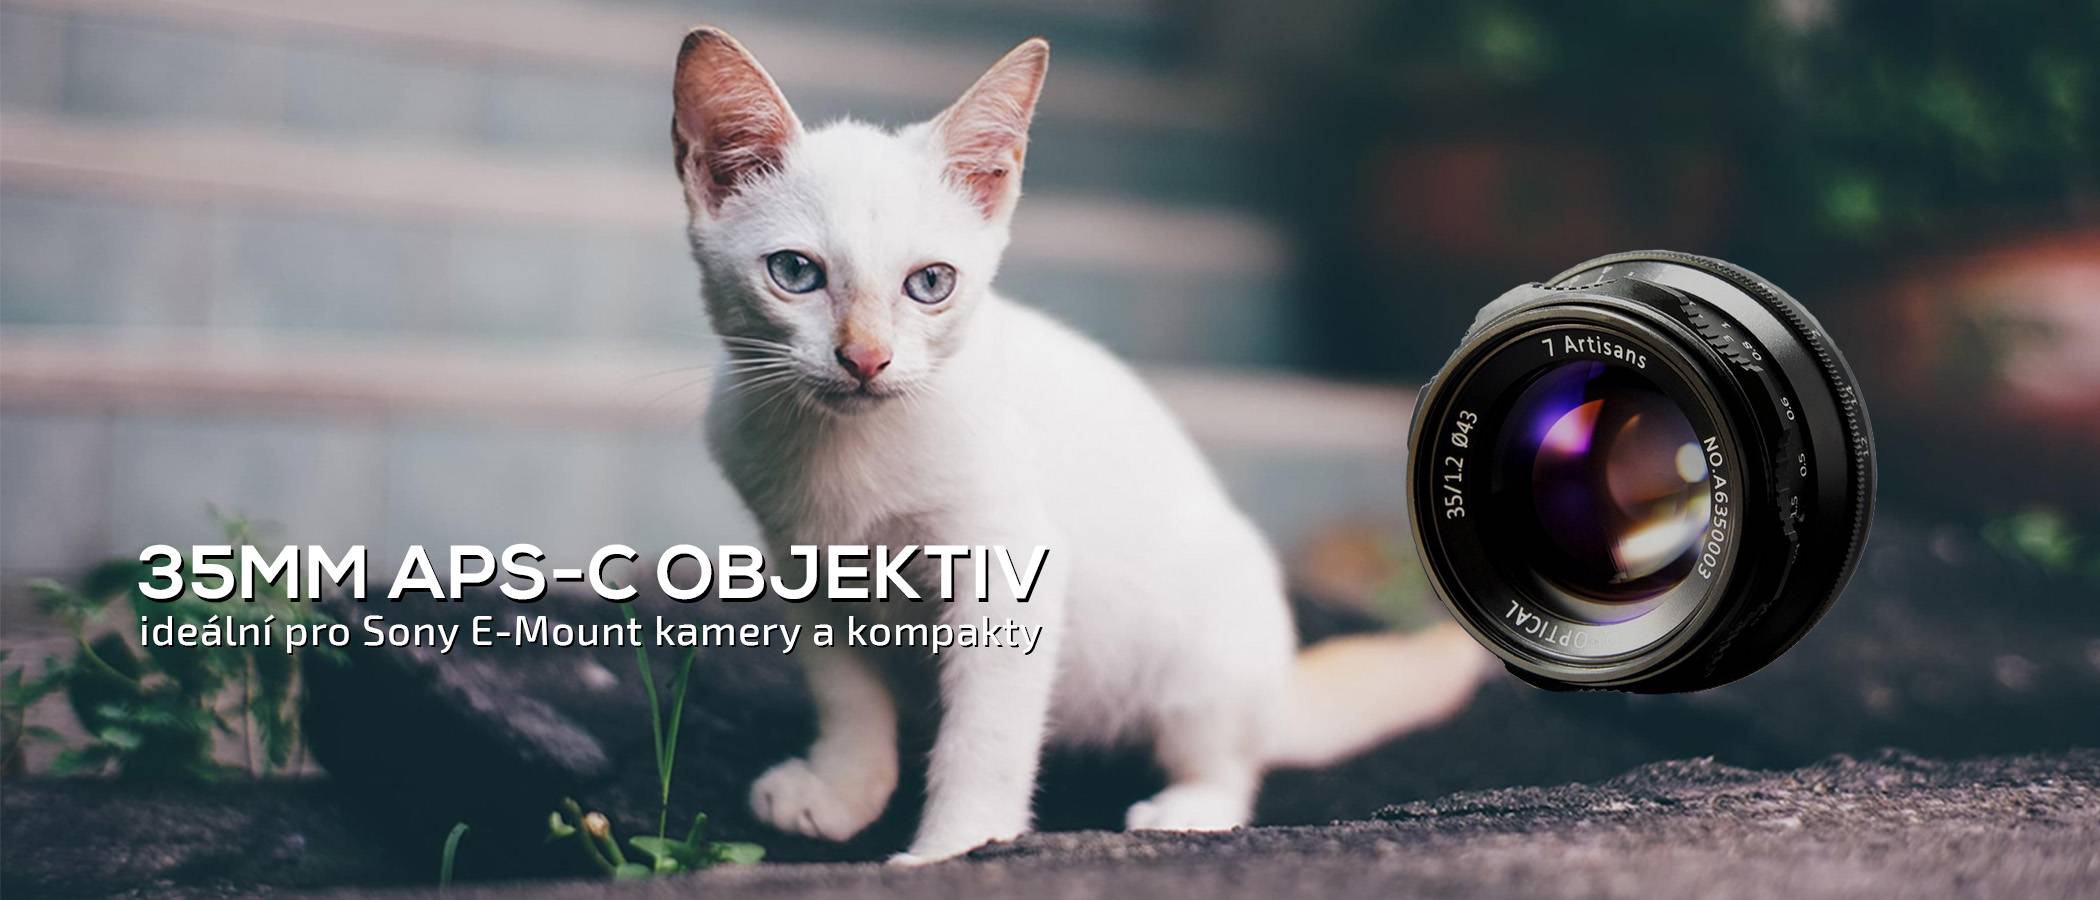 film-technika-7artisans-35-mm-aps-c-objektiv-sony-e